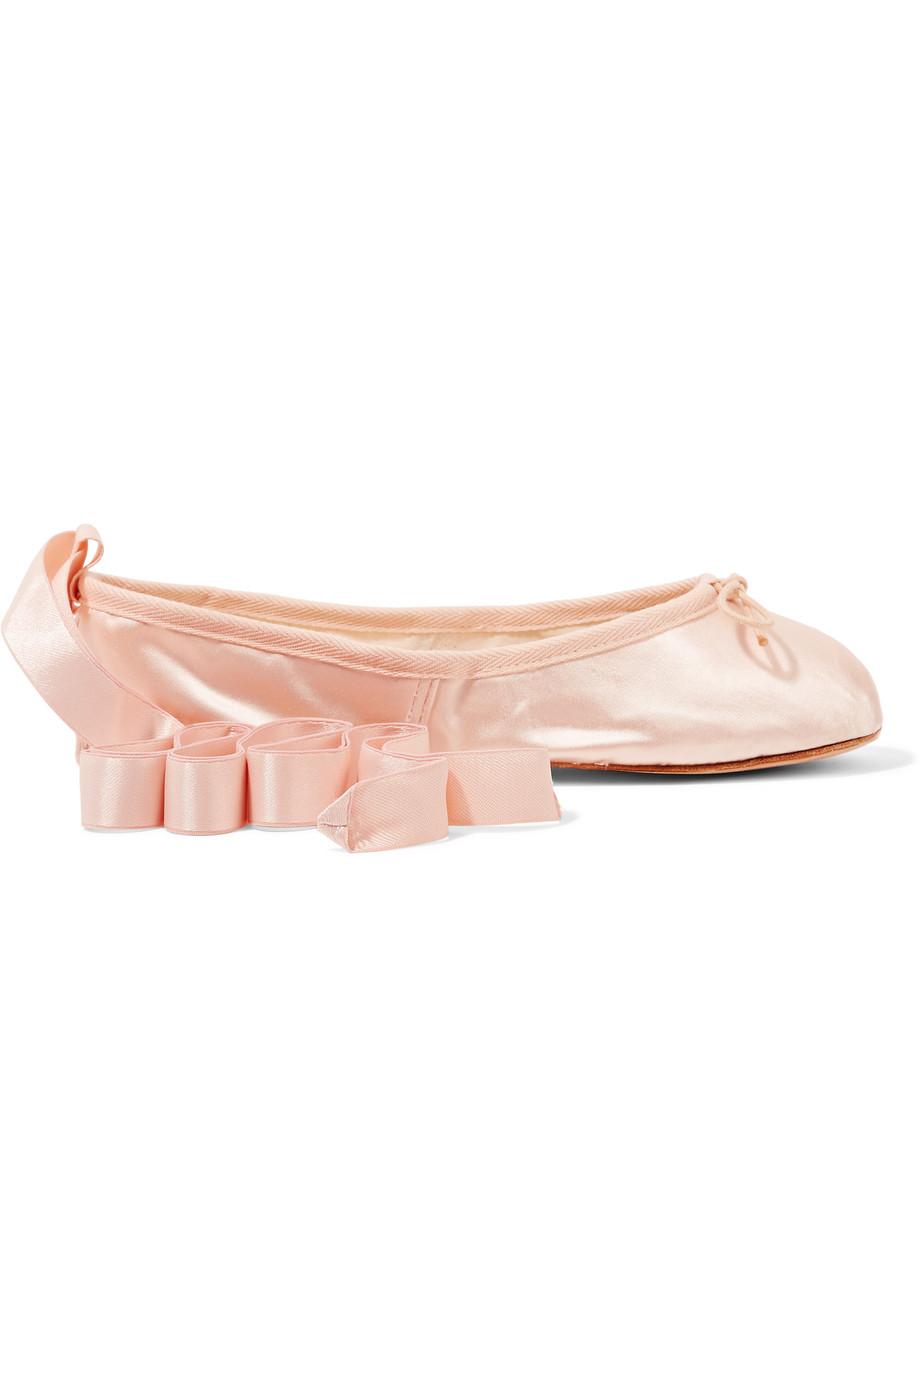 Satin Ballet Flats, Ballet Beautiful, Size: 36